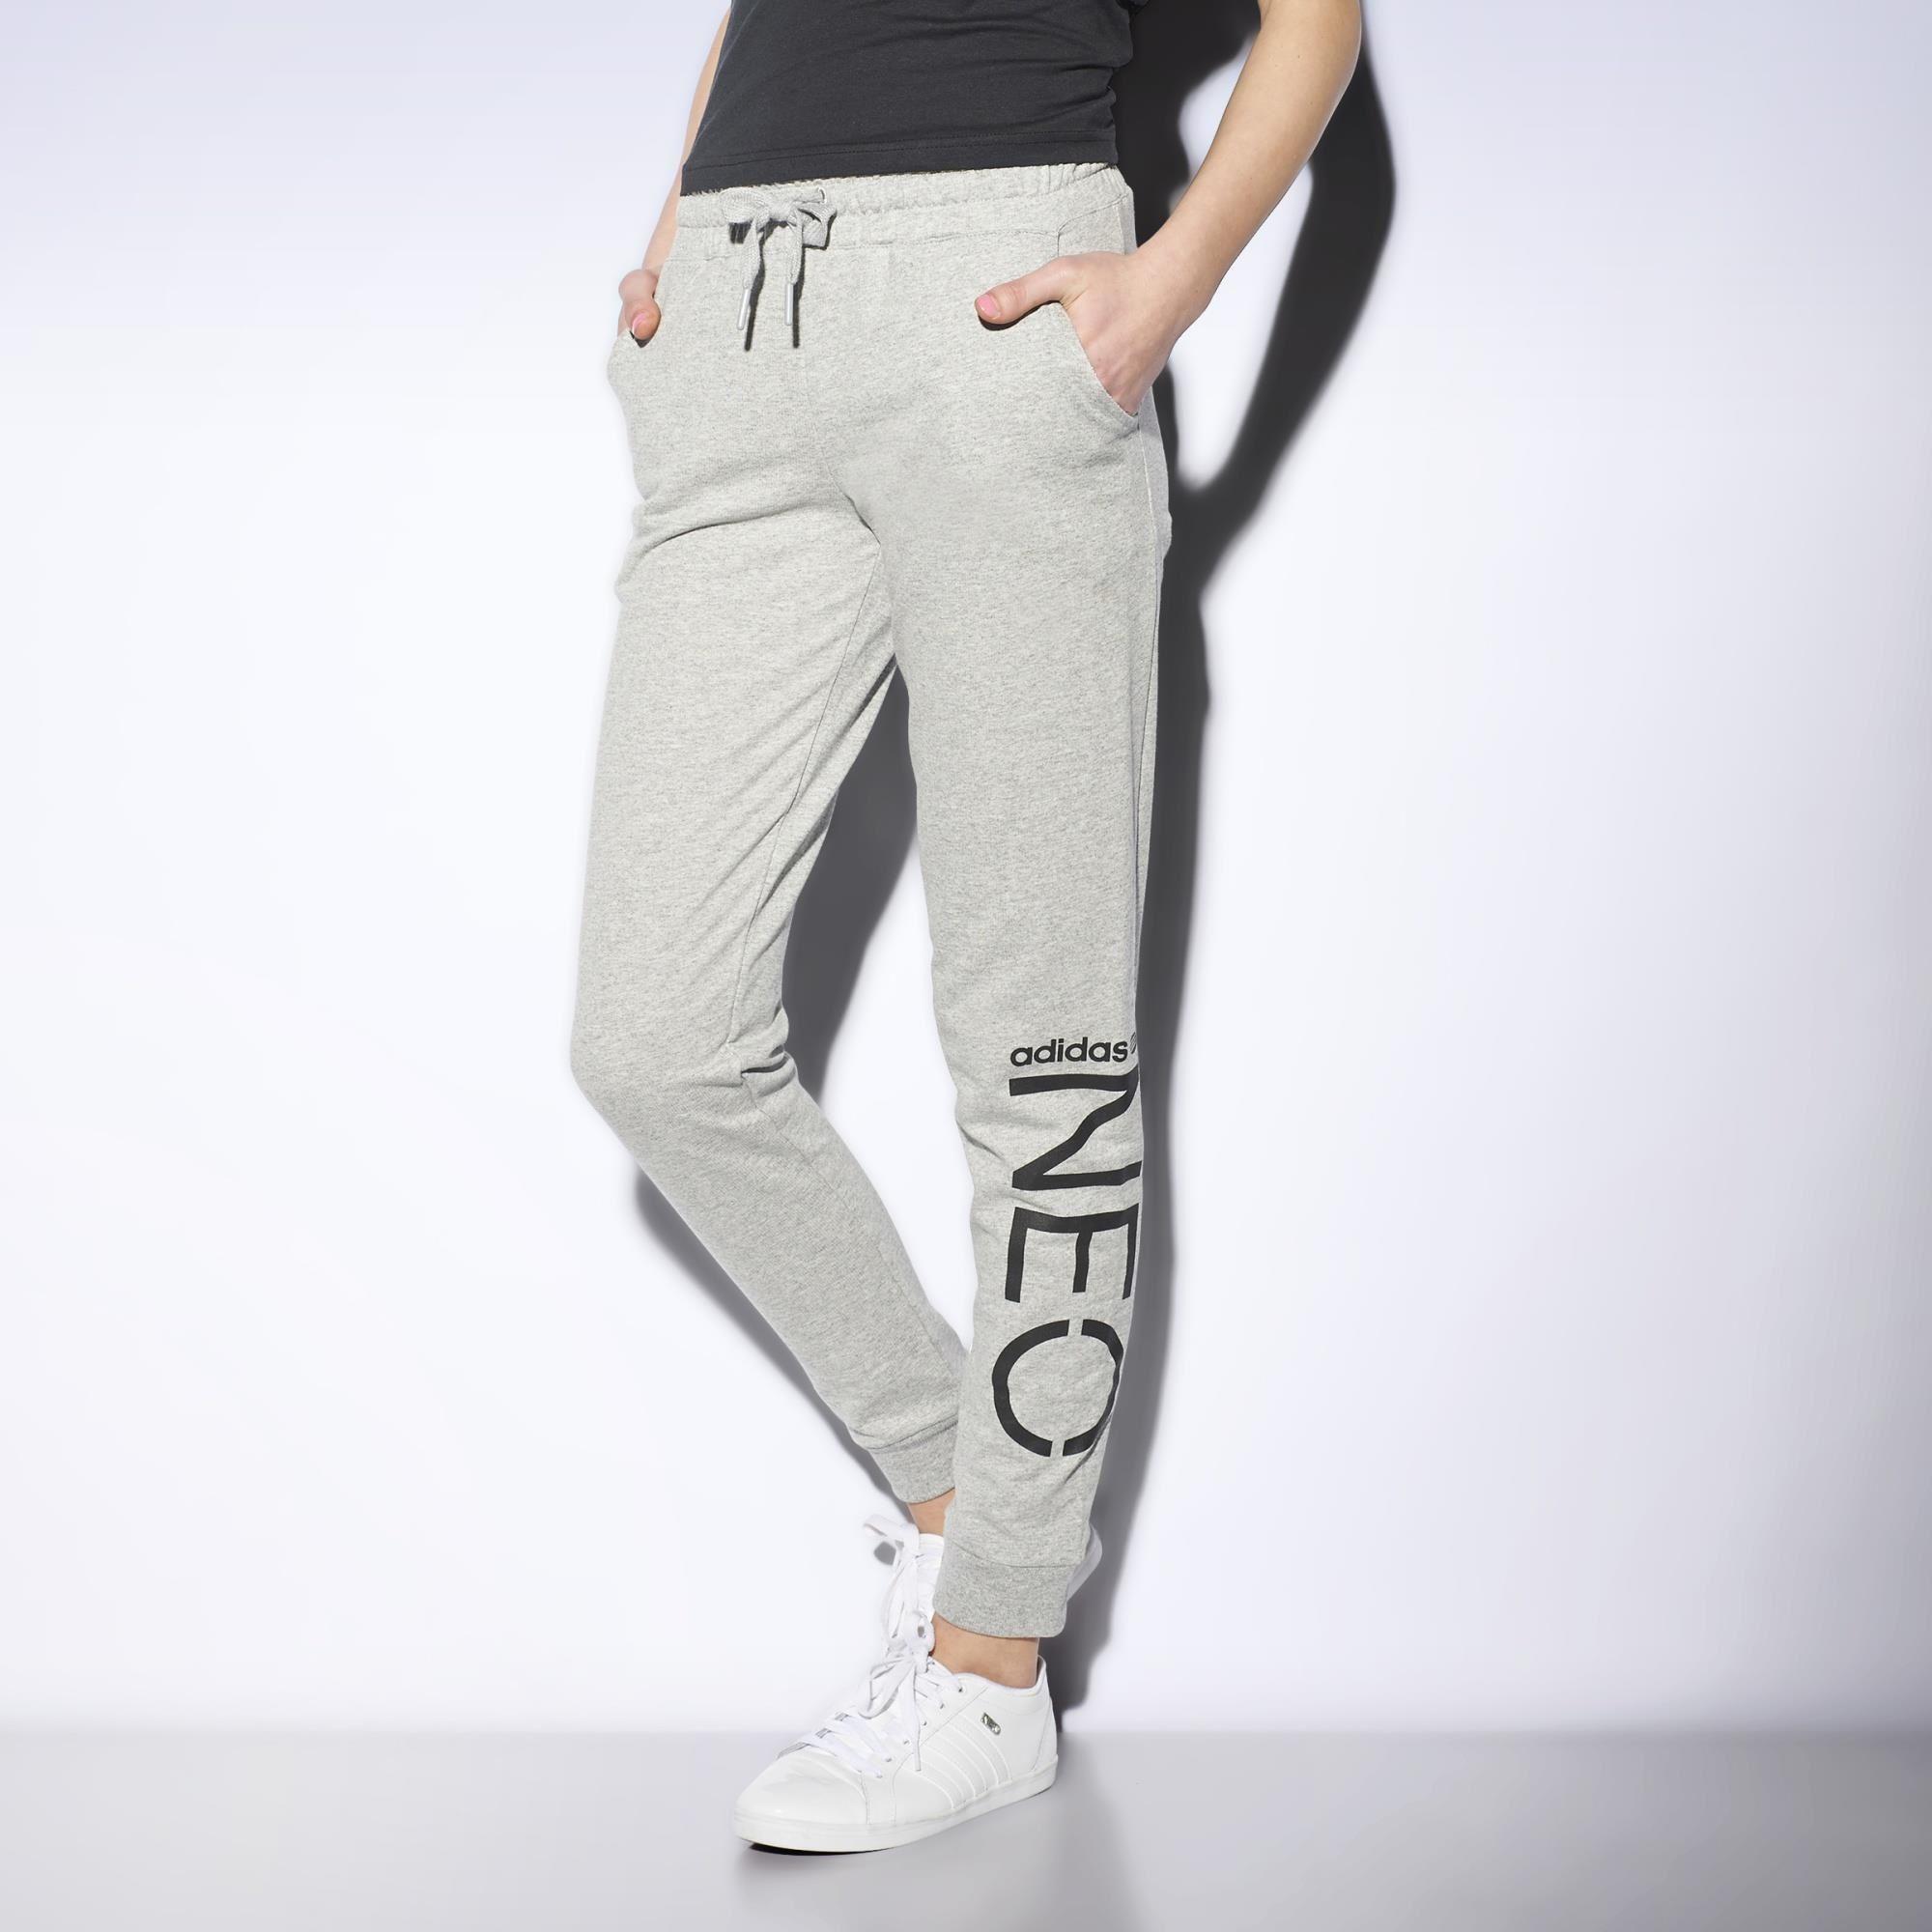 adidas neo jogger plus OFF78% pect.se!